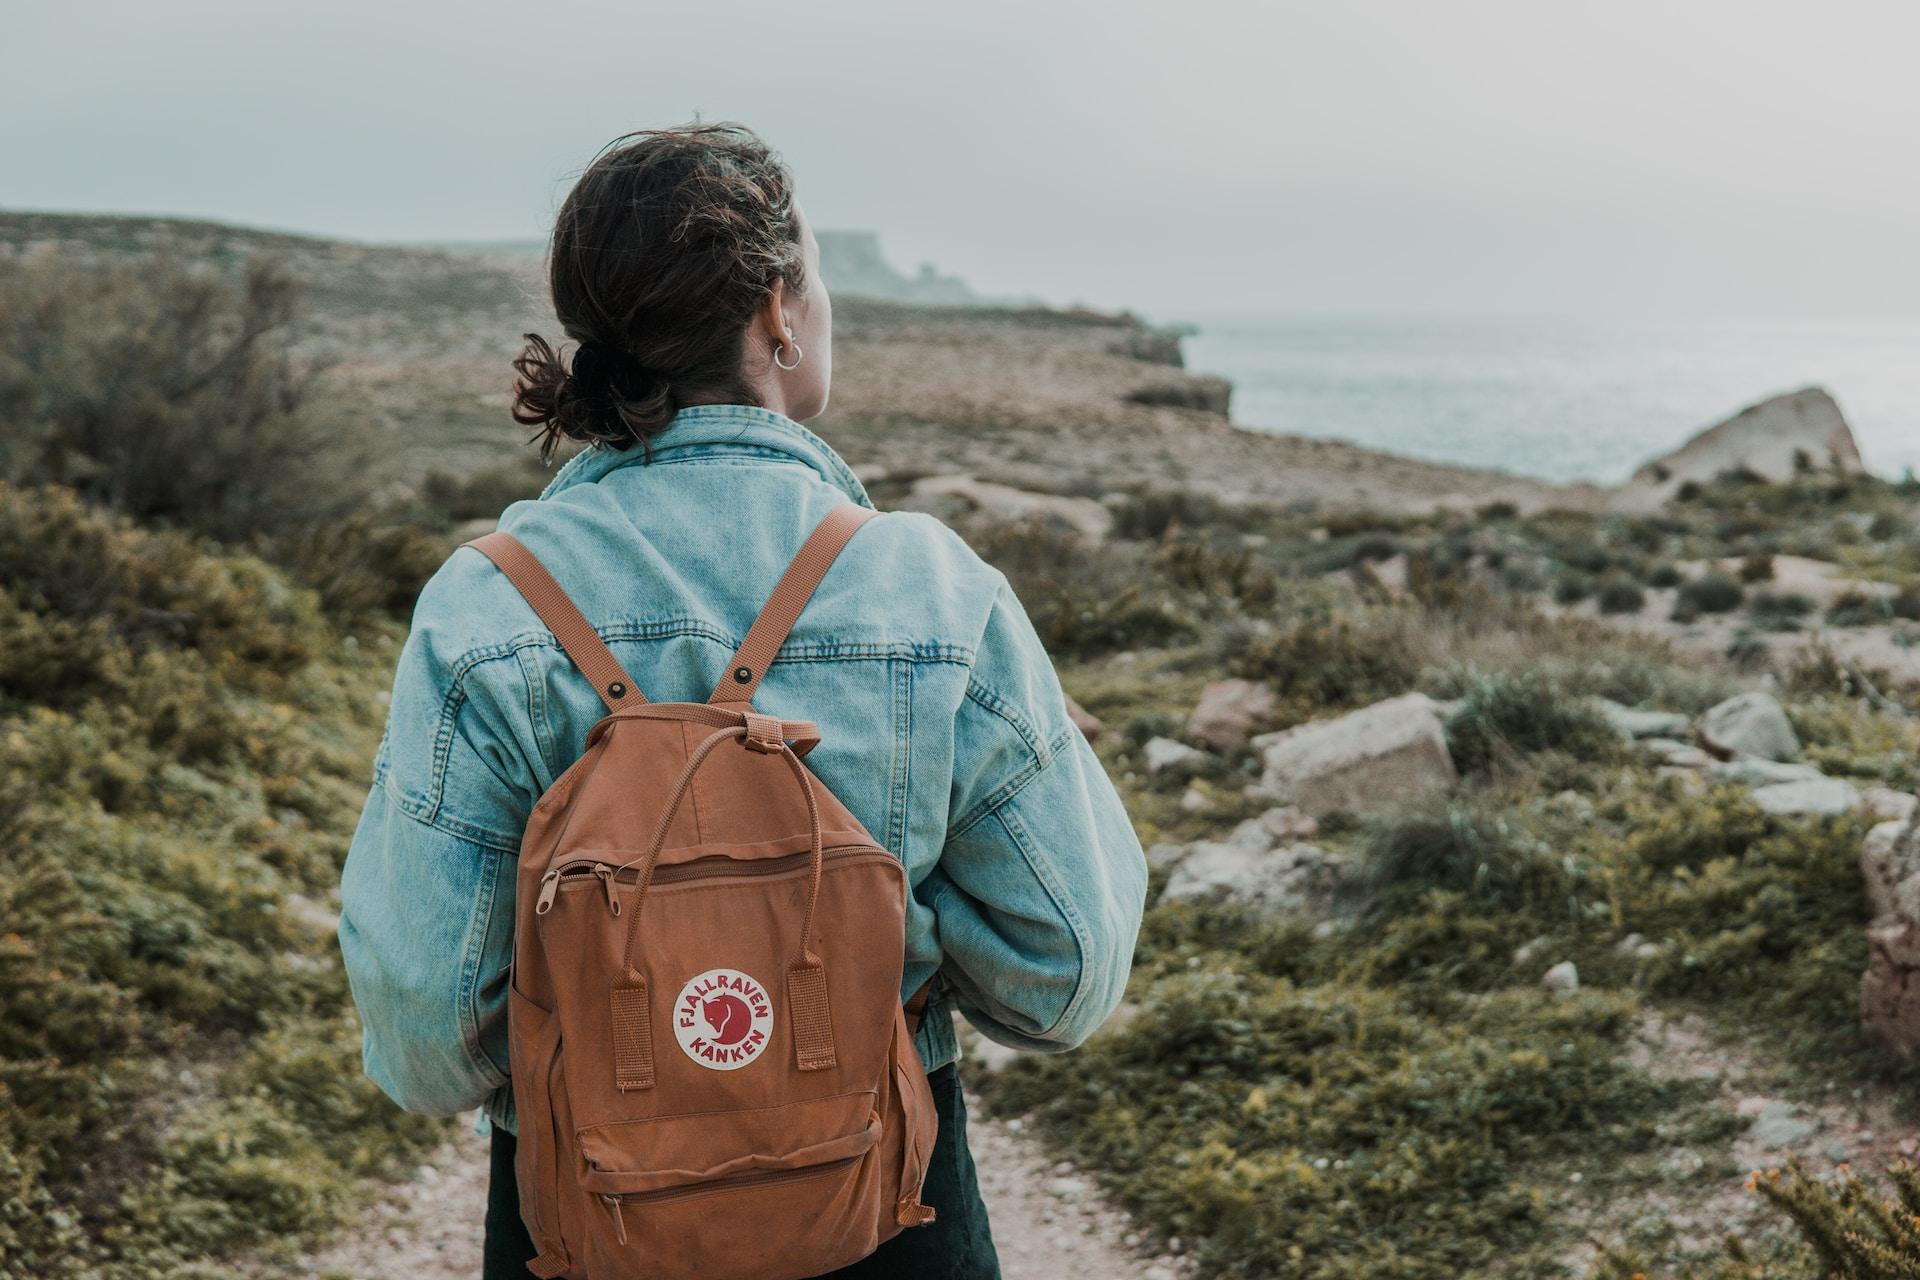 woman wearing blue denim jacket with brown backpack walking on trail near beach